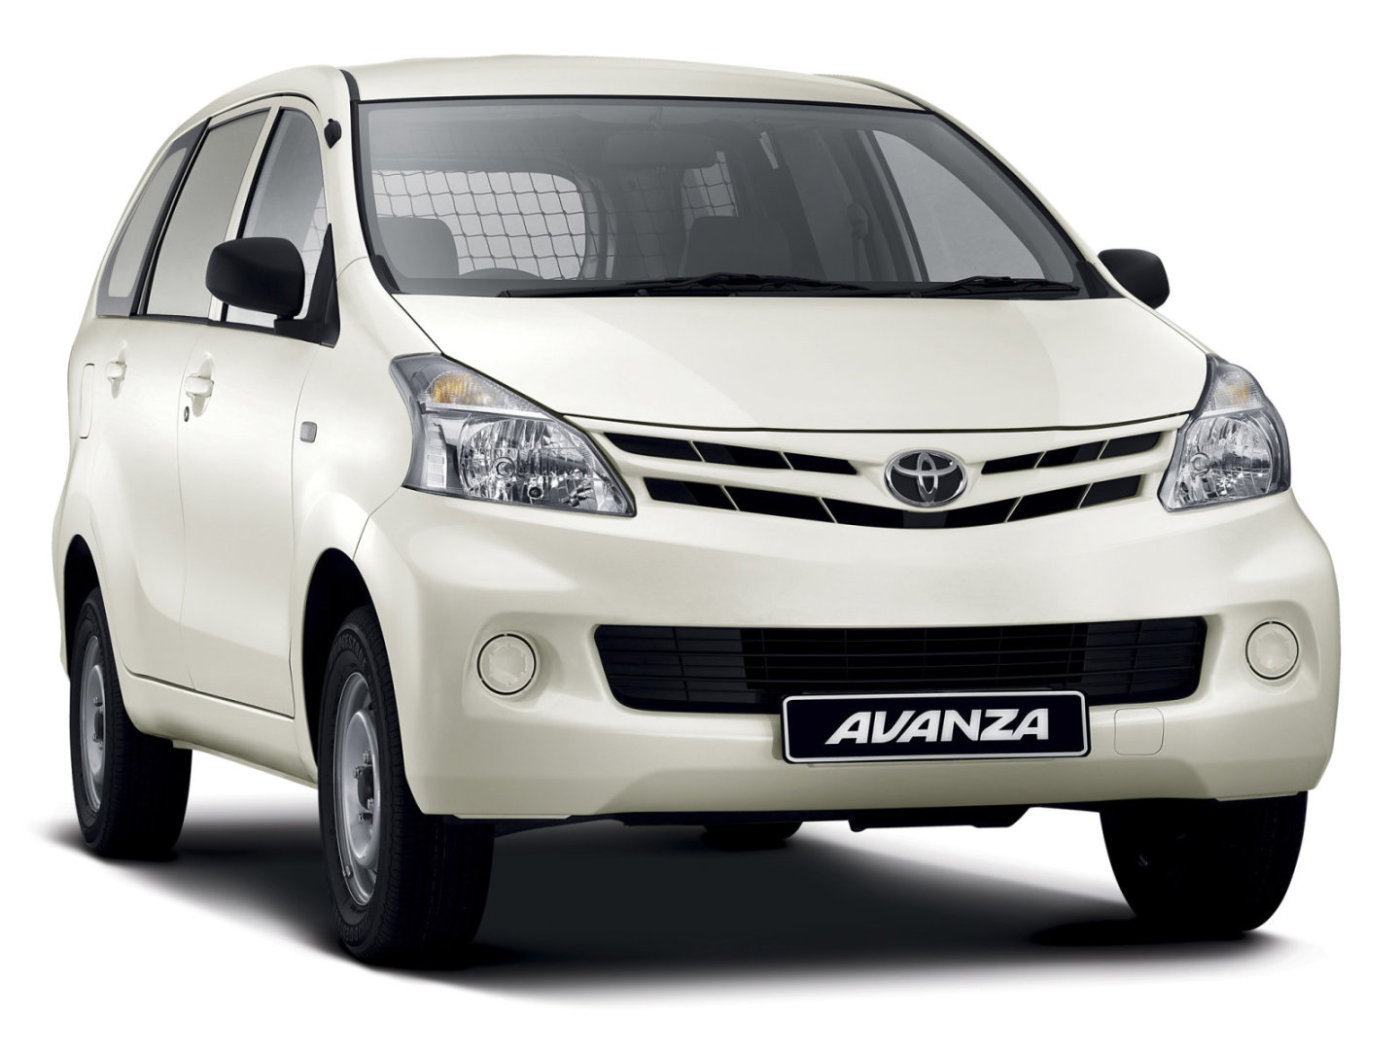 Grand New Avanza Veloz 1.5 Putih All Toyota Camry 2019 Harga Mobil Baru On The Road Otr Tipe